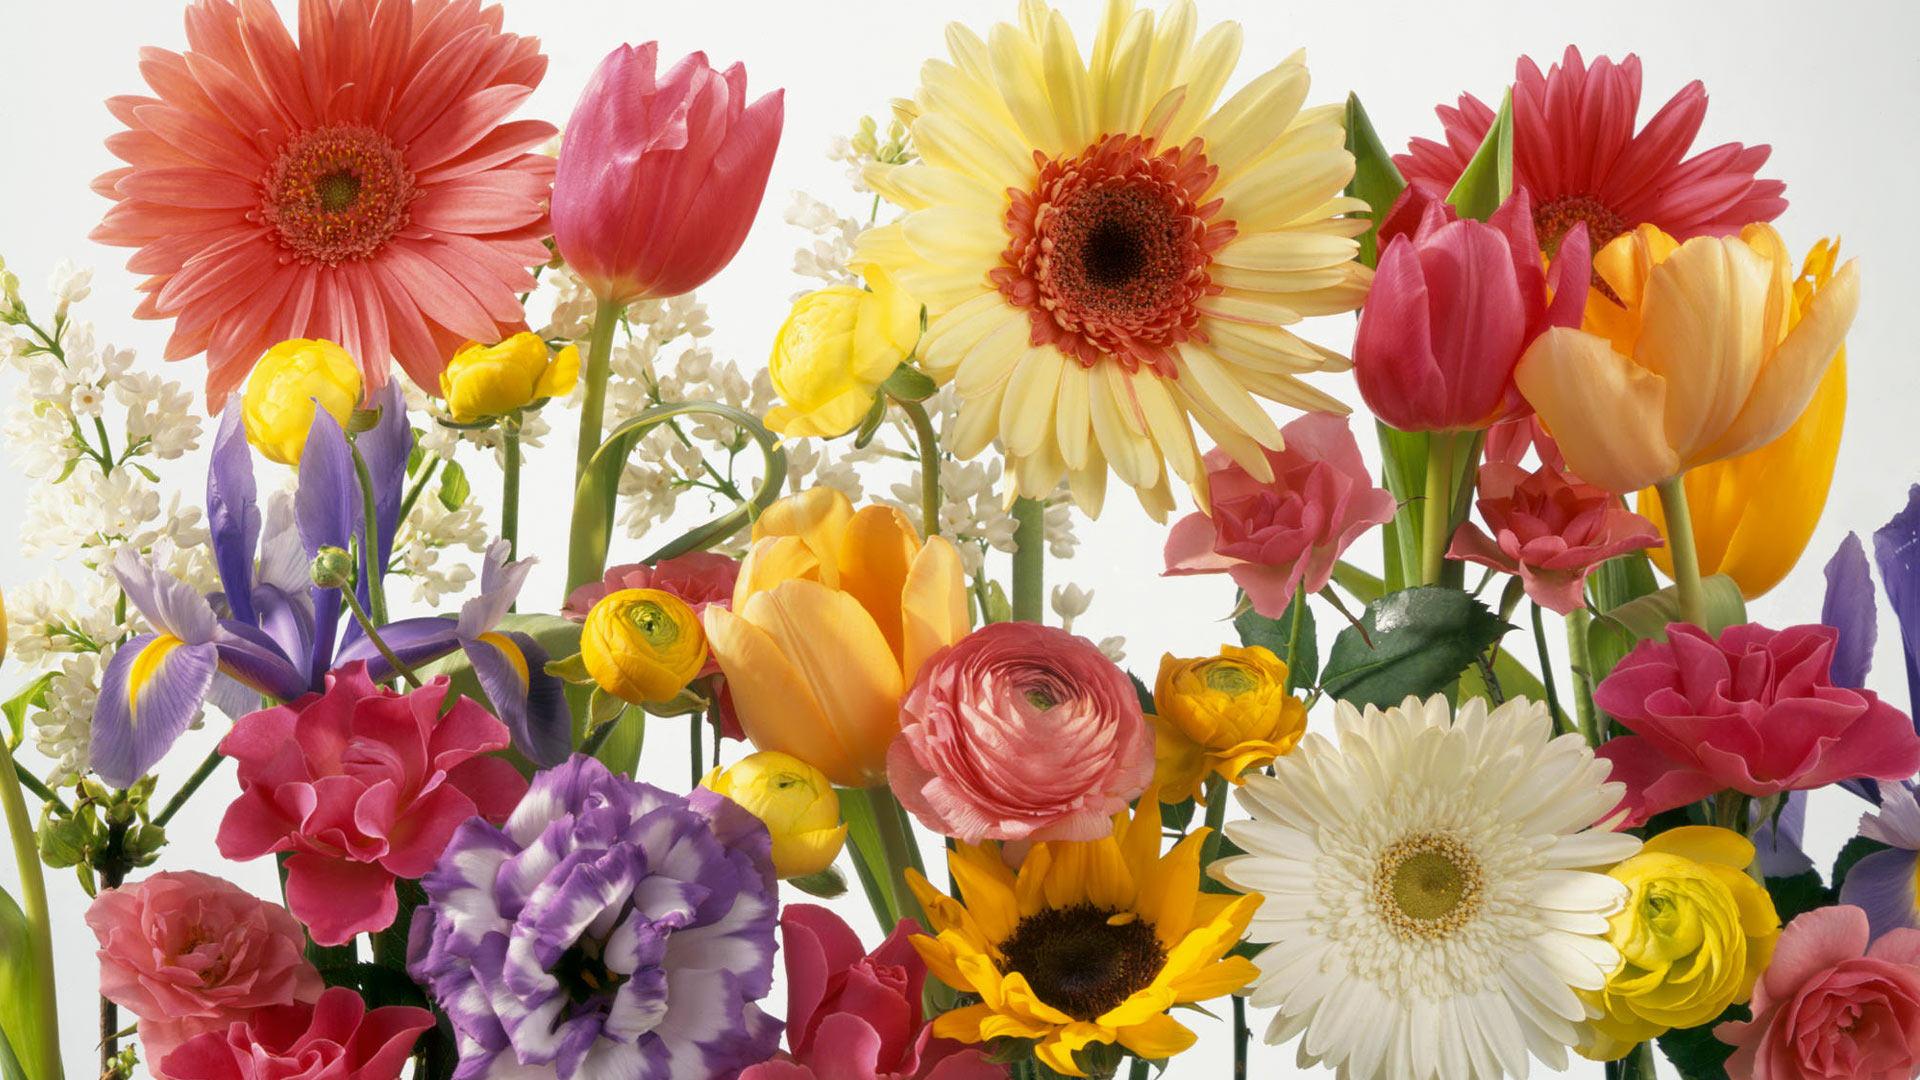 spring wallpapers hd desktop background flowers spring wallpapers 1920x1080